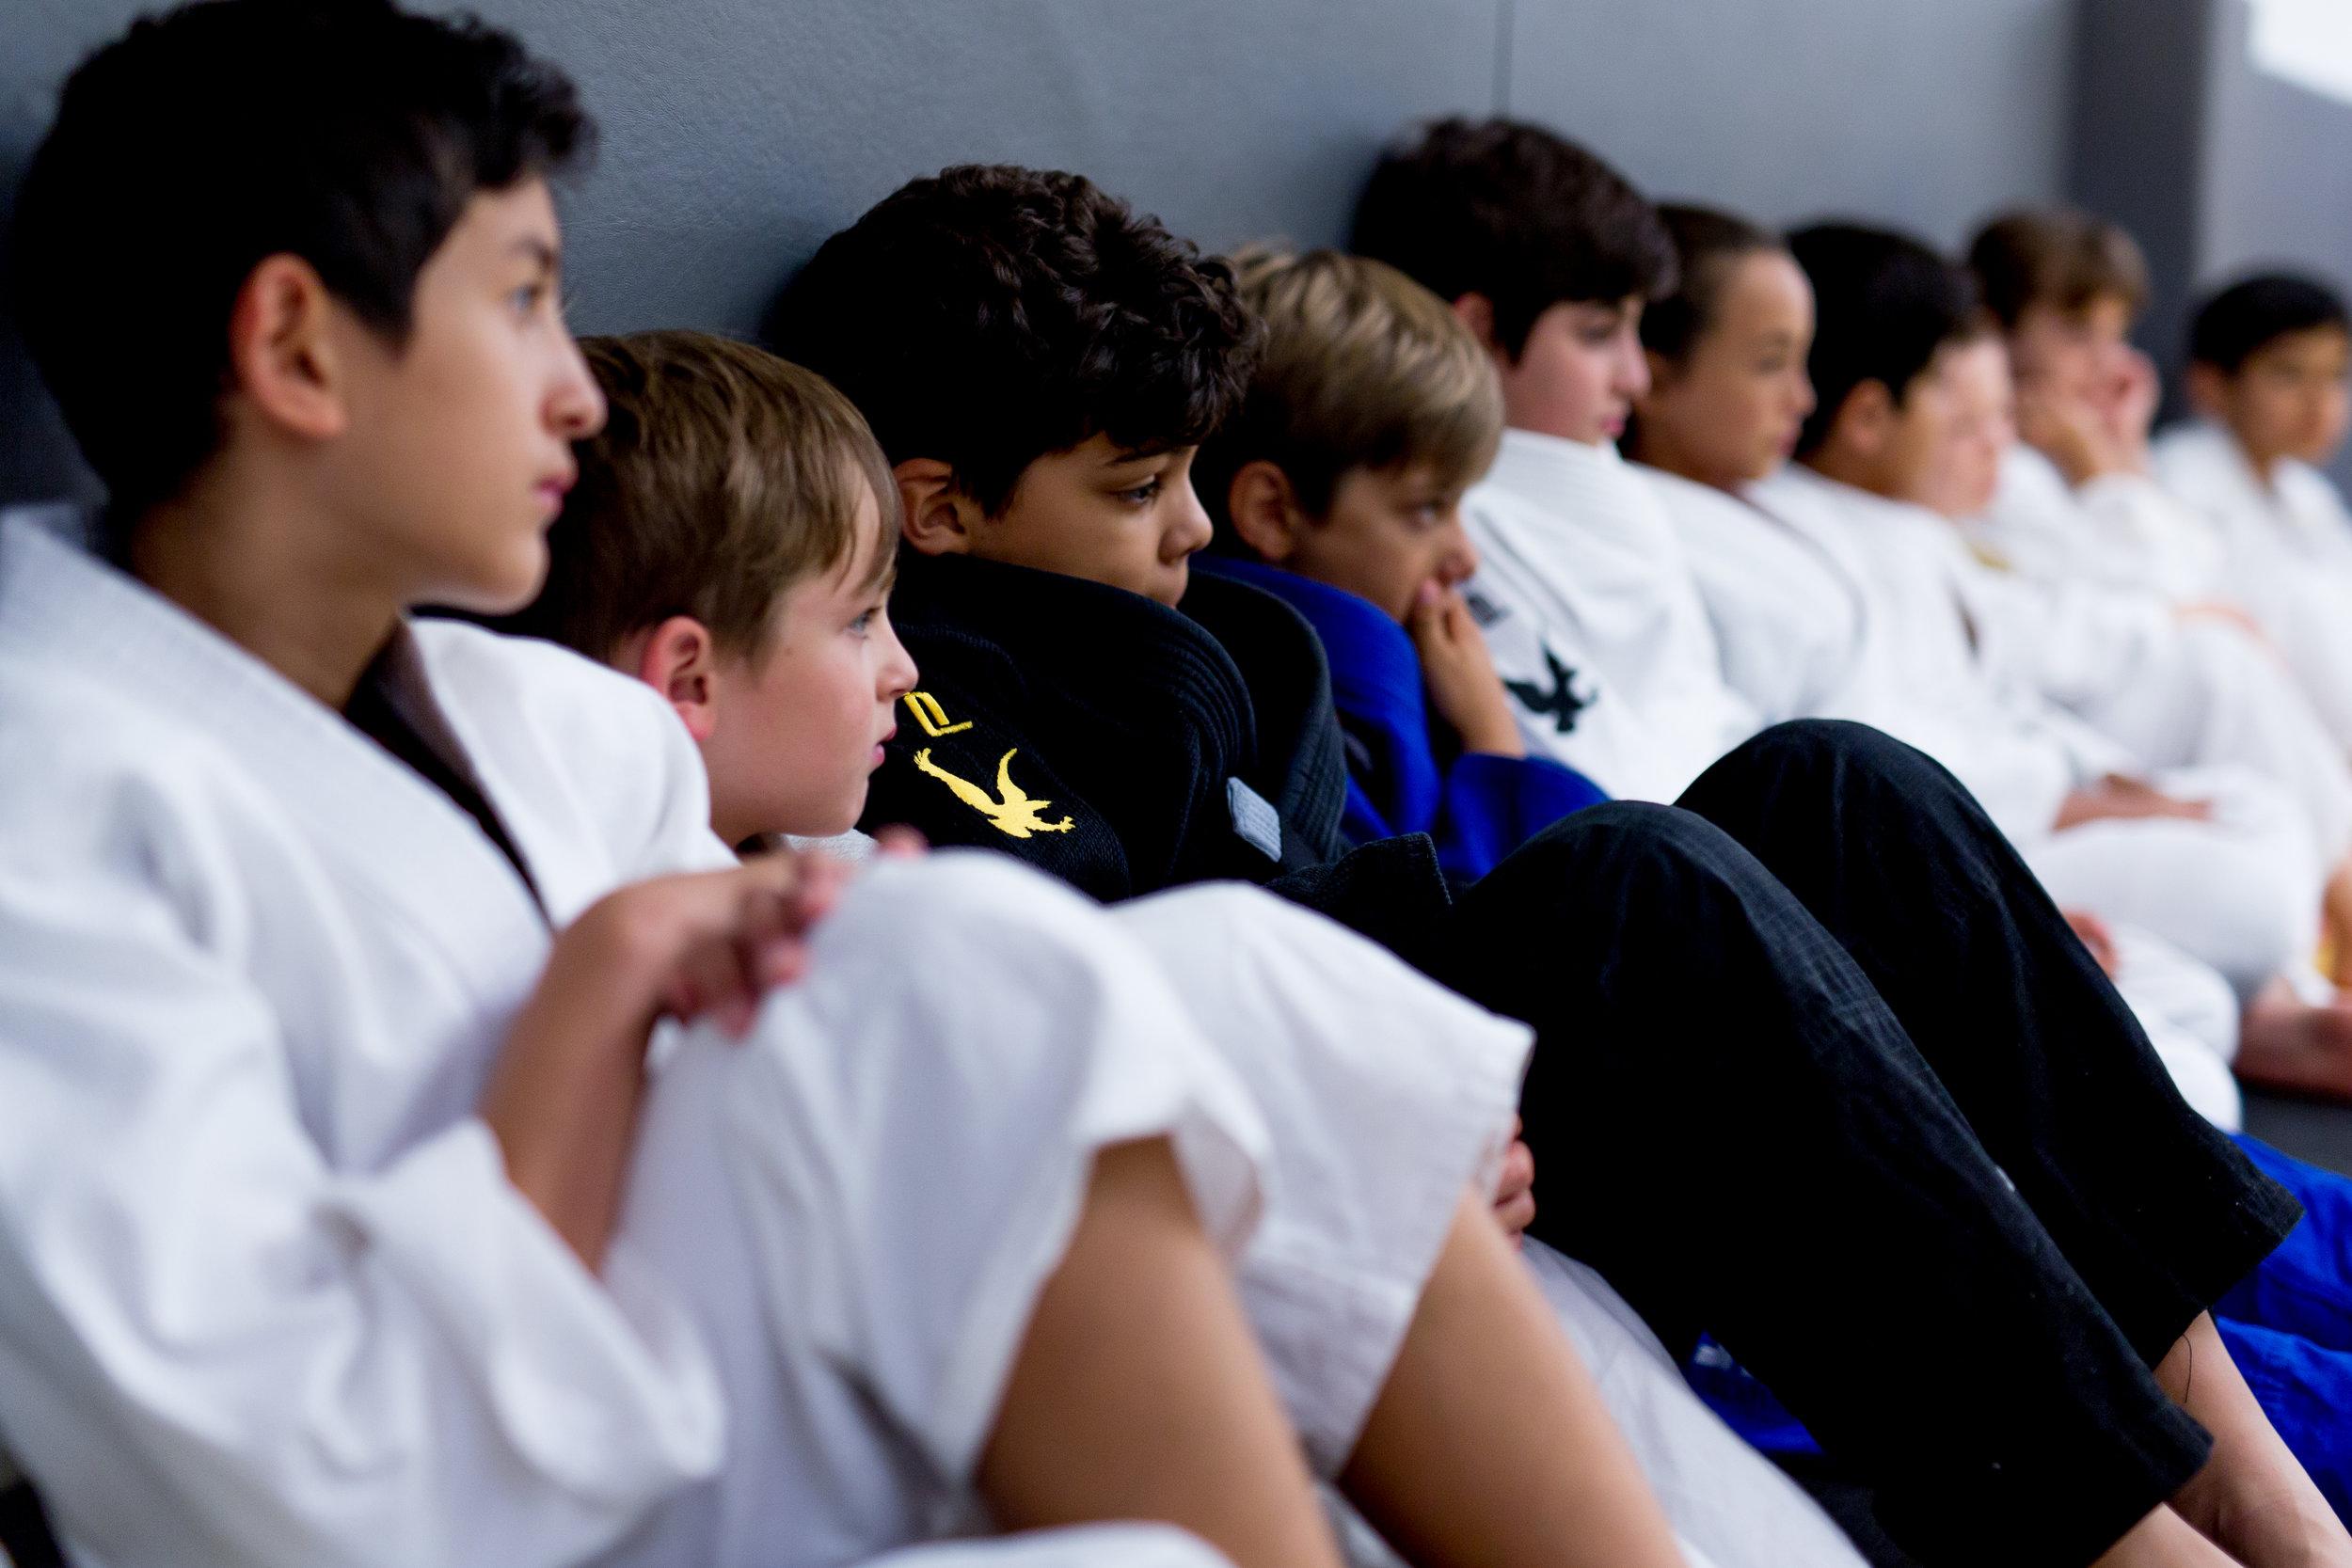 Martial arts kids lewes